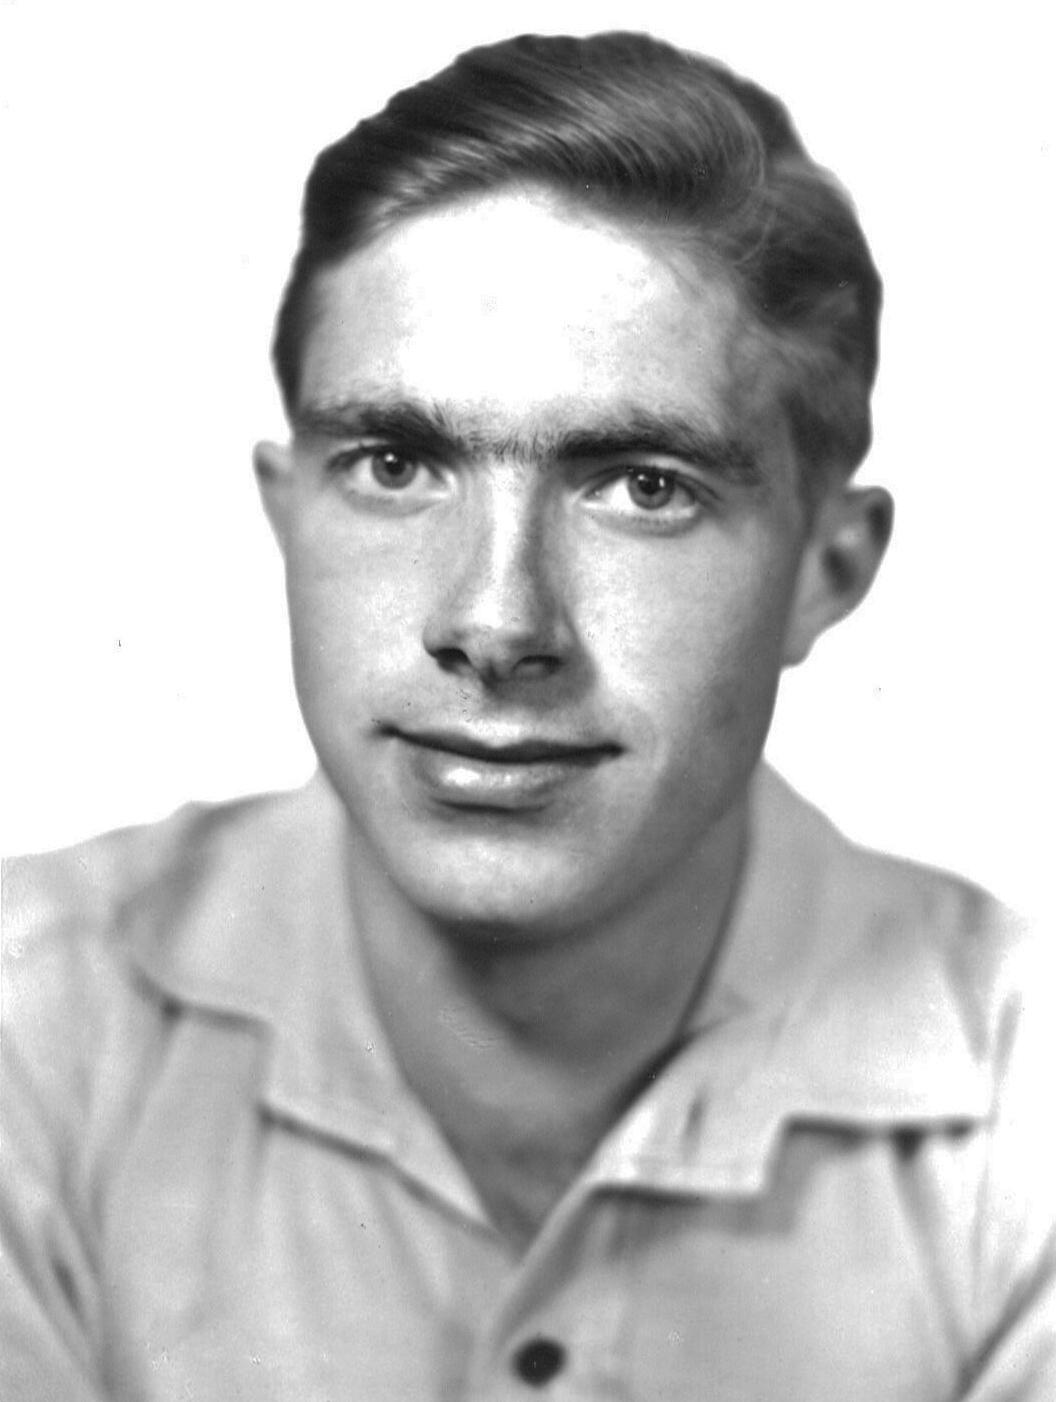 Hans Niermann (Foto: Archiv des Jugendhauses Düsseldorf)